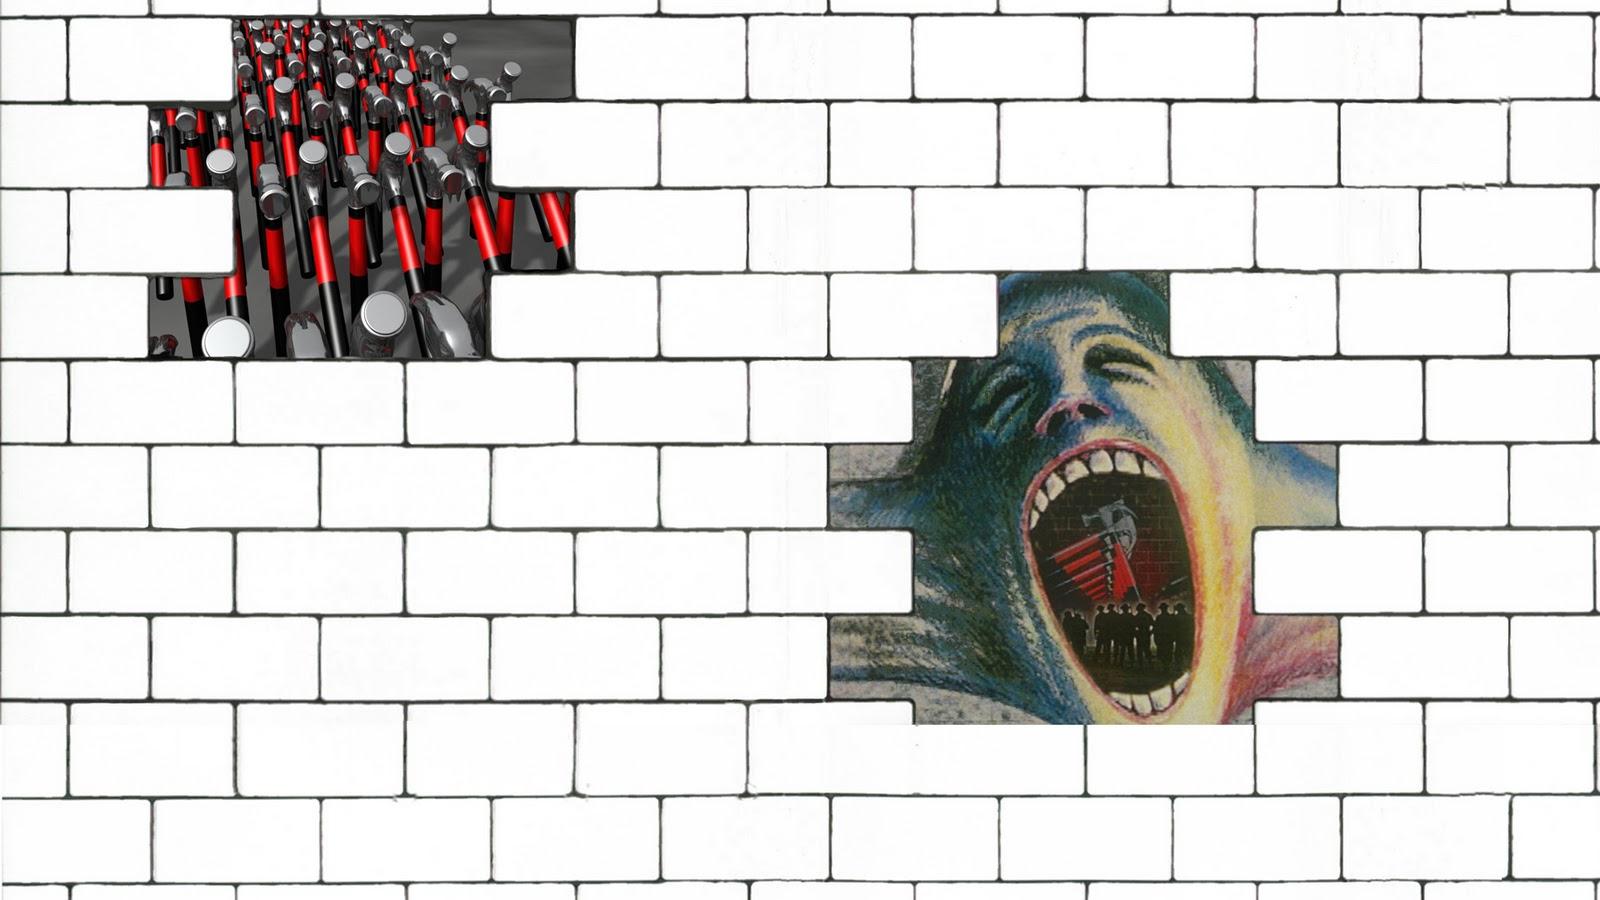 Wallpaper for the Wall - WallpaperSafari